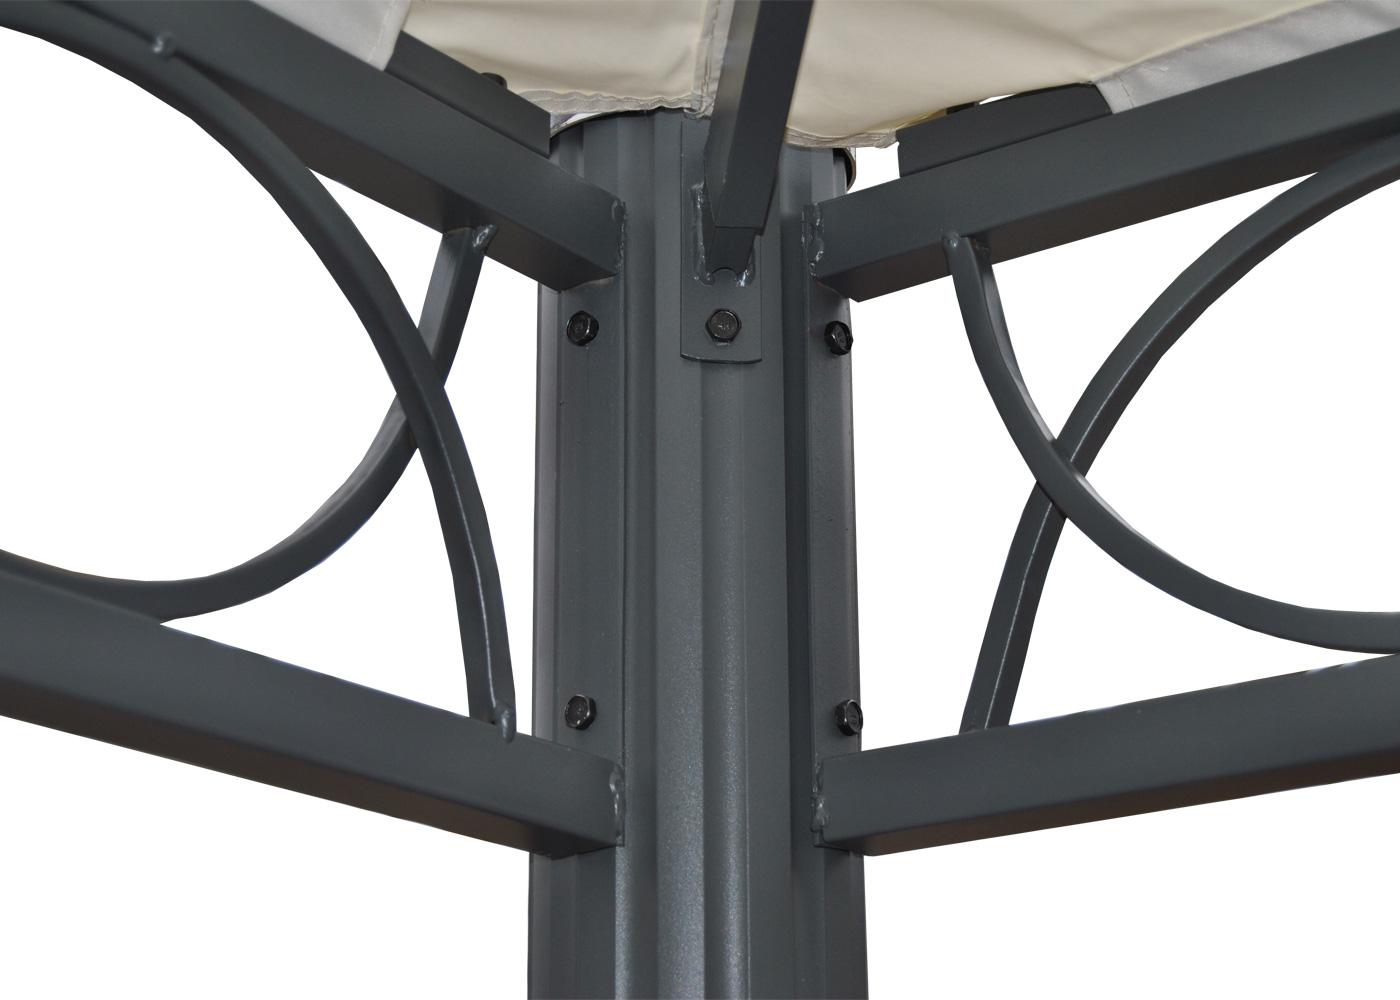 pergola belagua 3x3m garten pavillon stabiles alu gestell. Black Bedroom Furniture Sets. Home Design Ideas